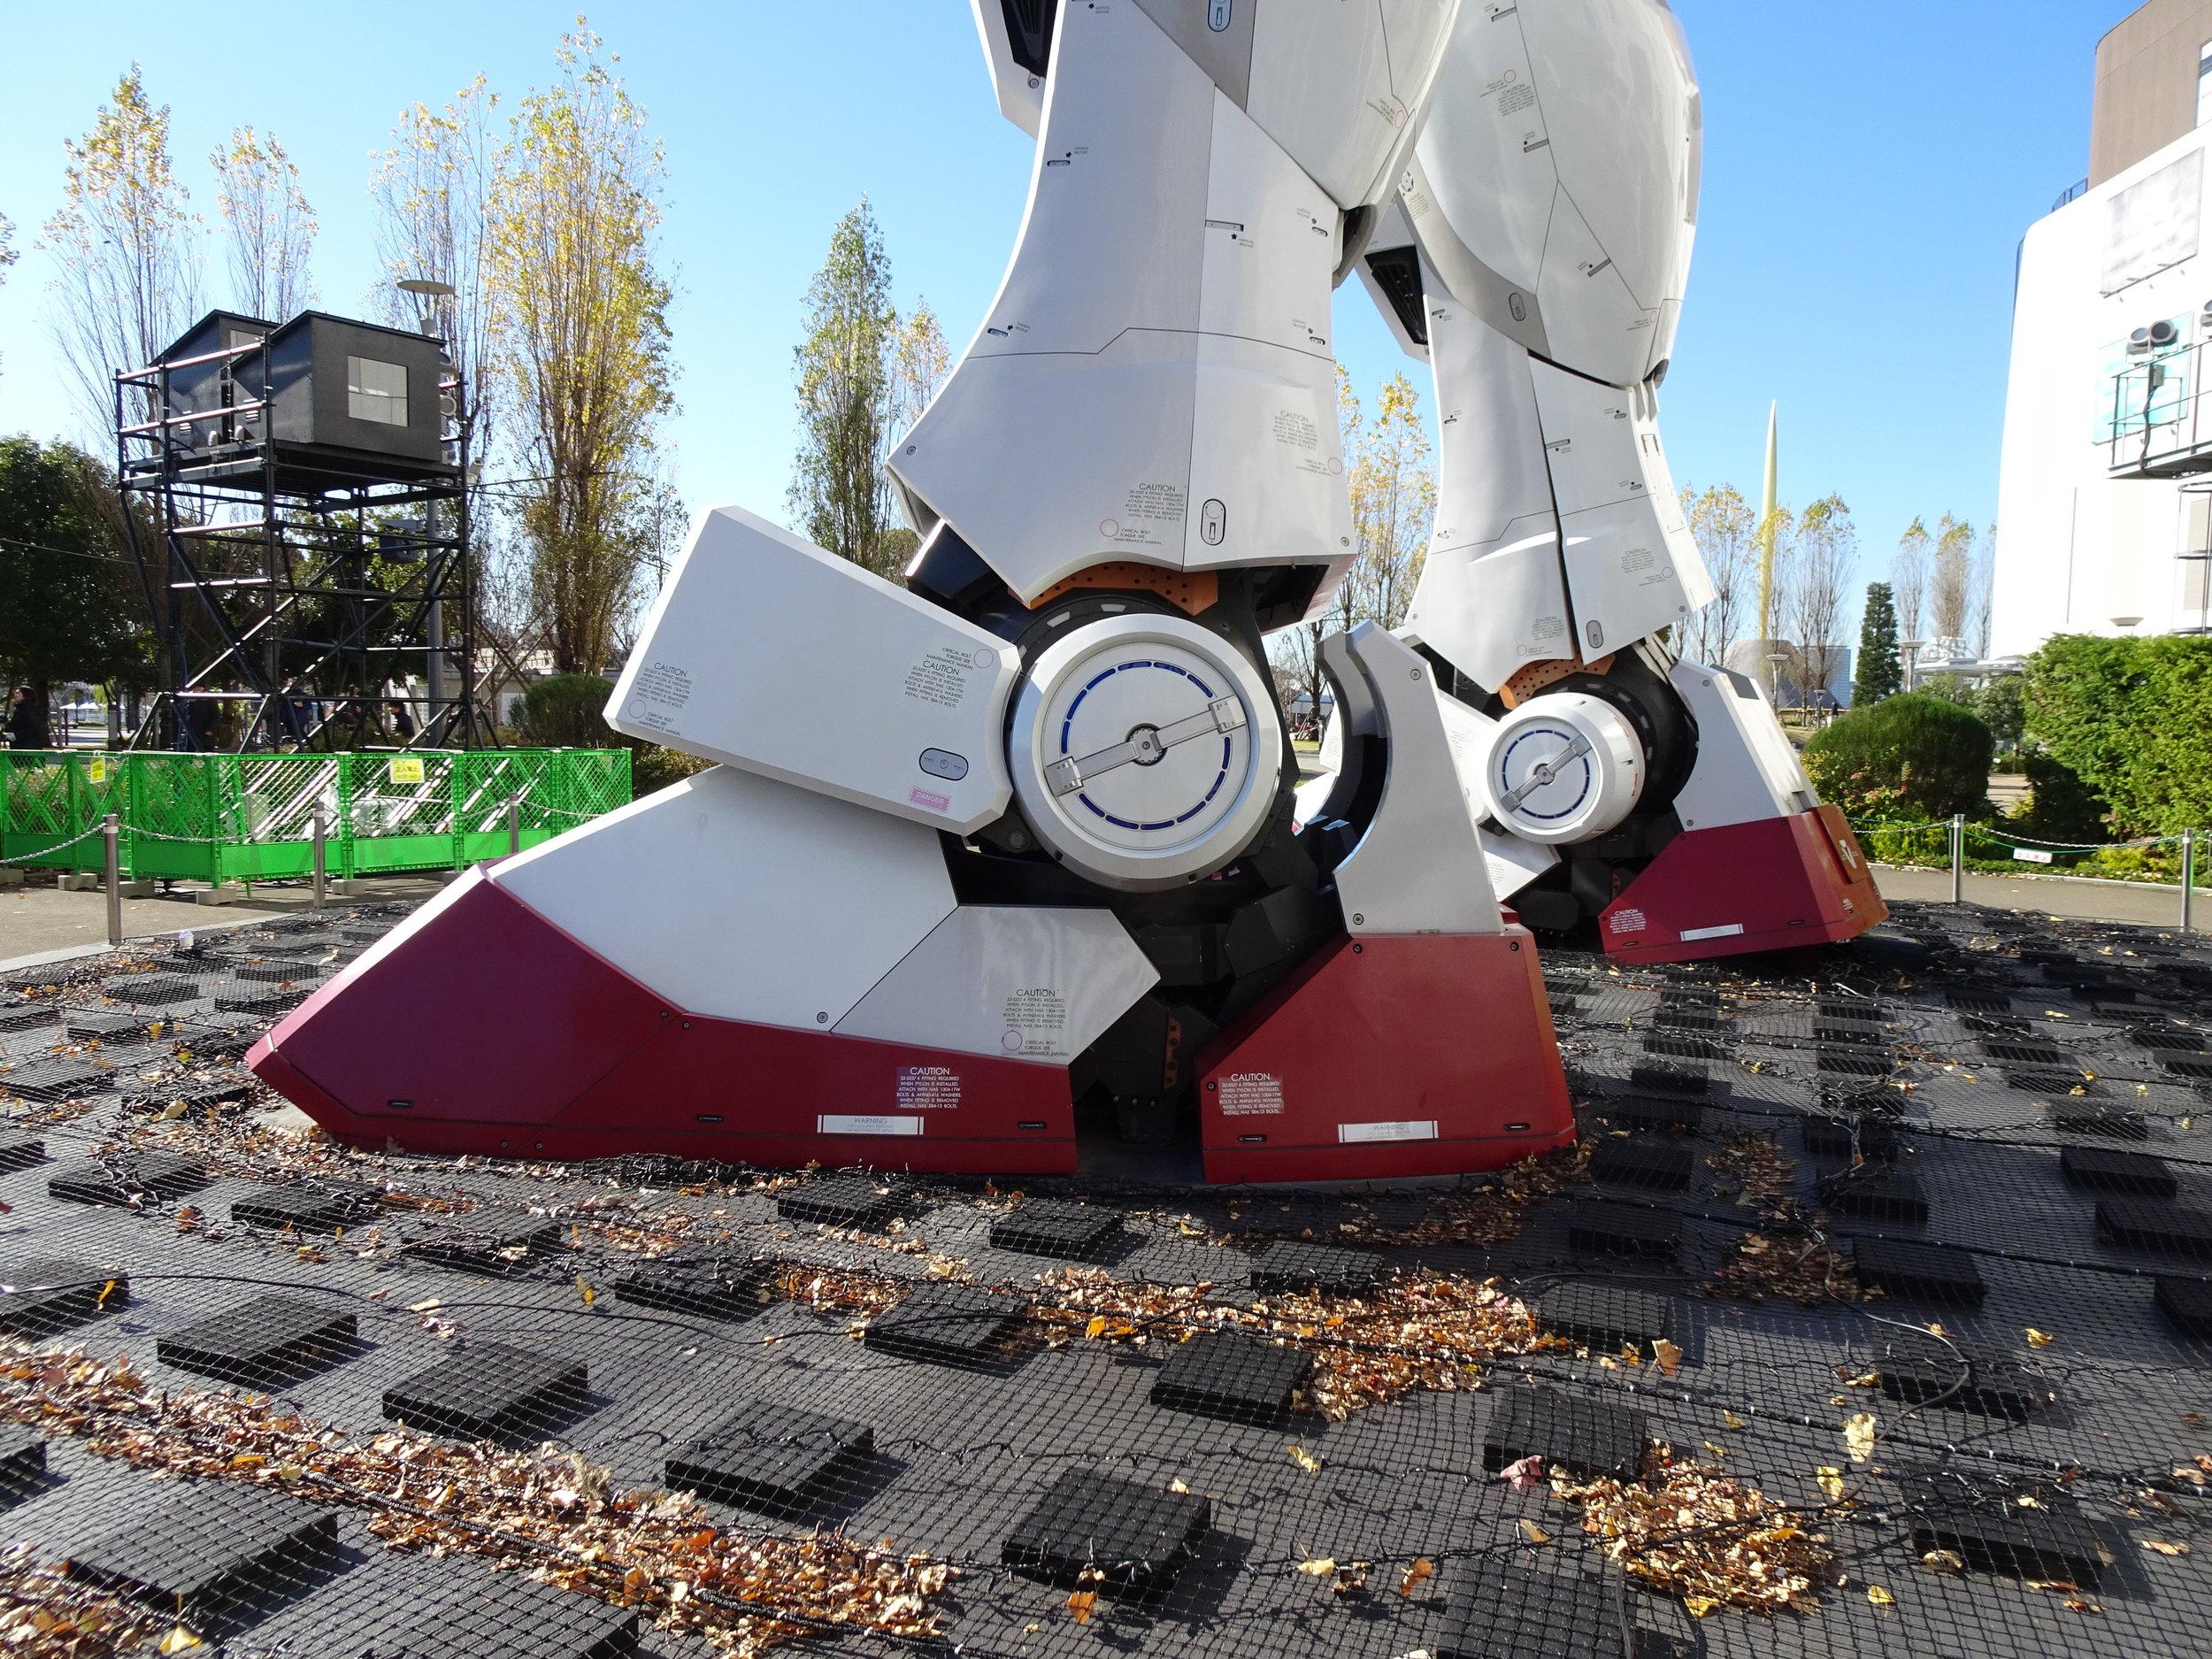 RX-78-2 Gundam 1-1 Statue - 063.jpg